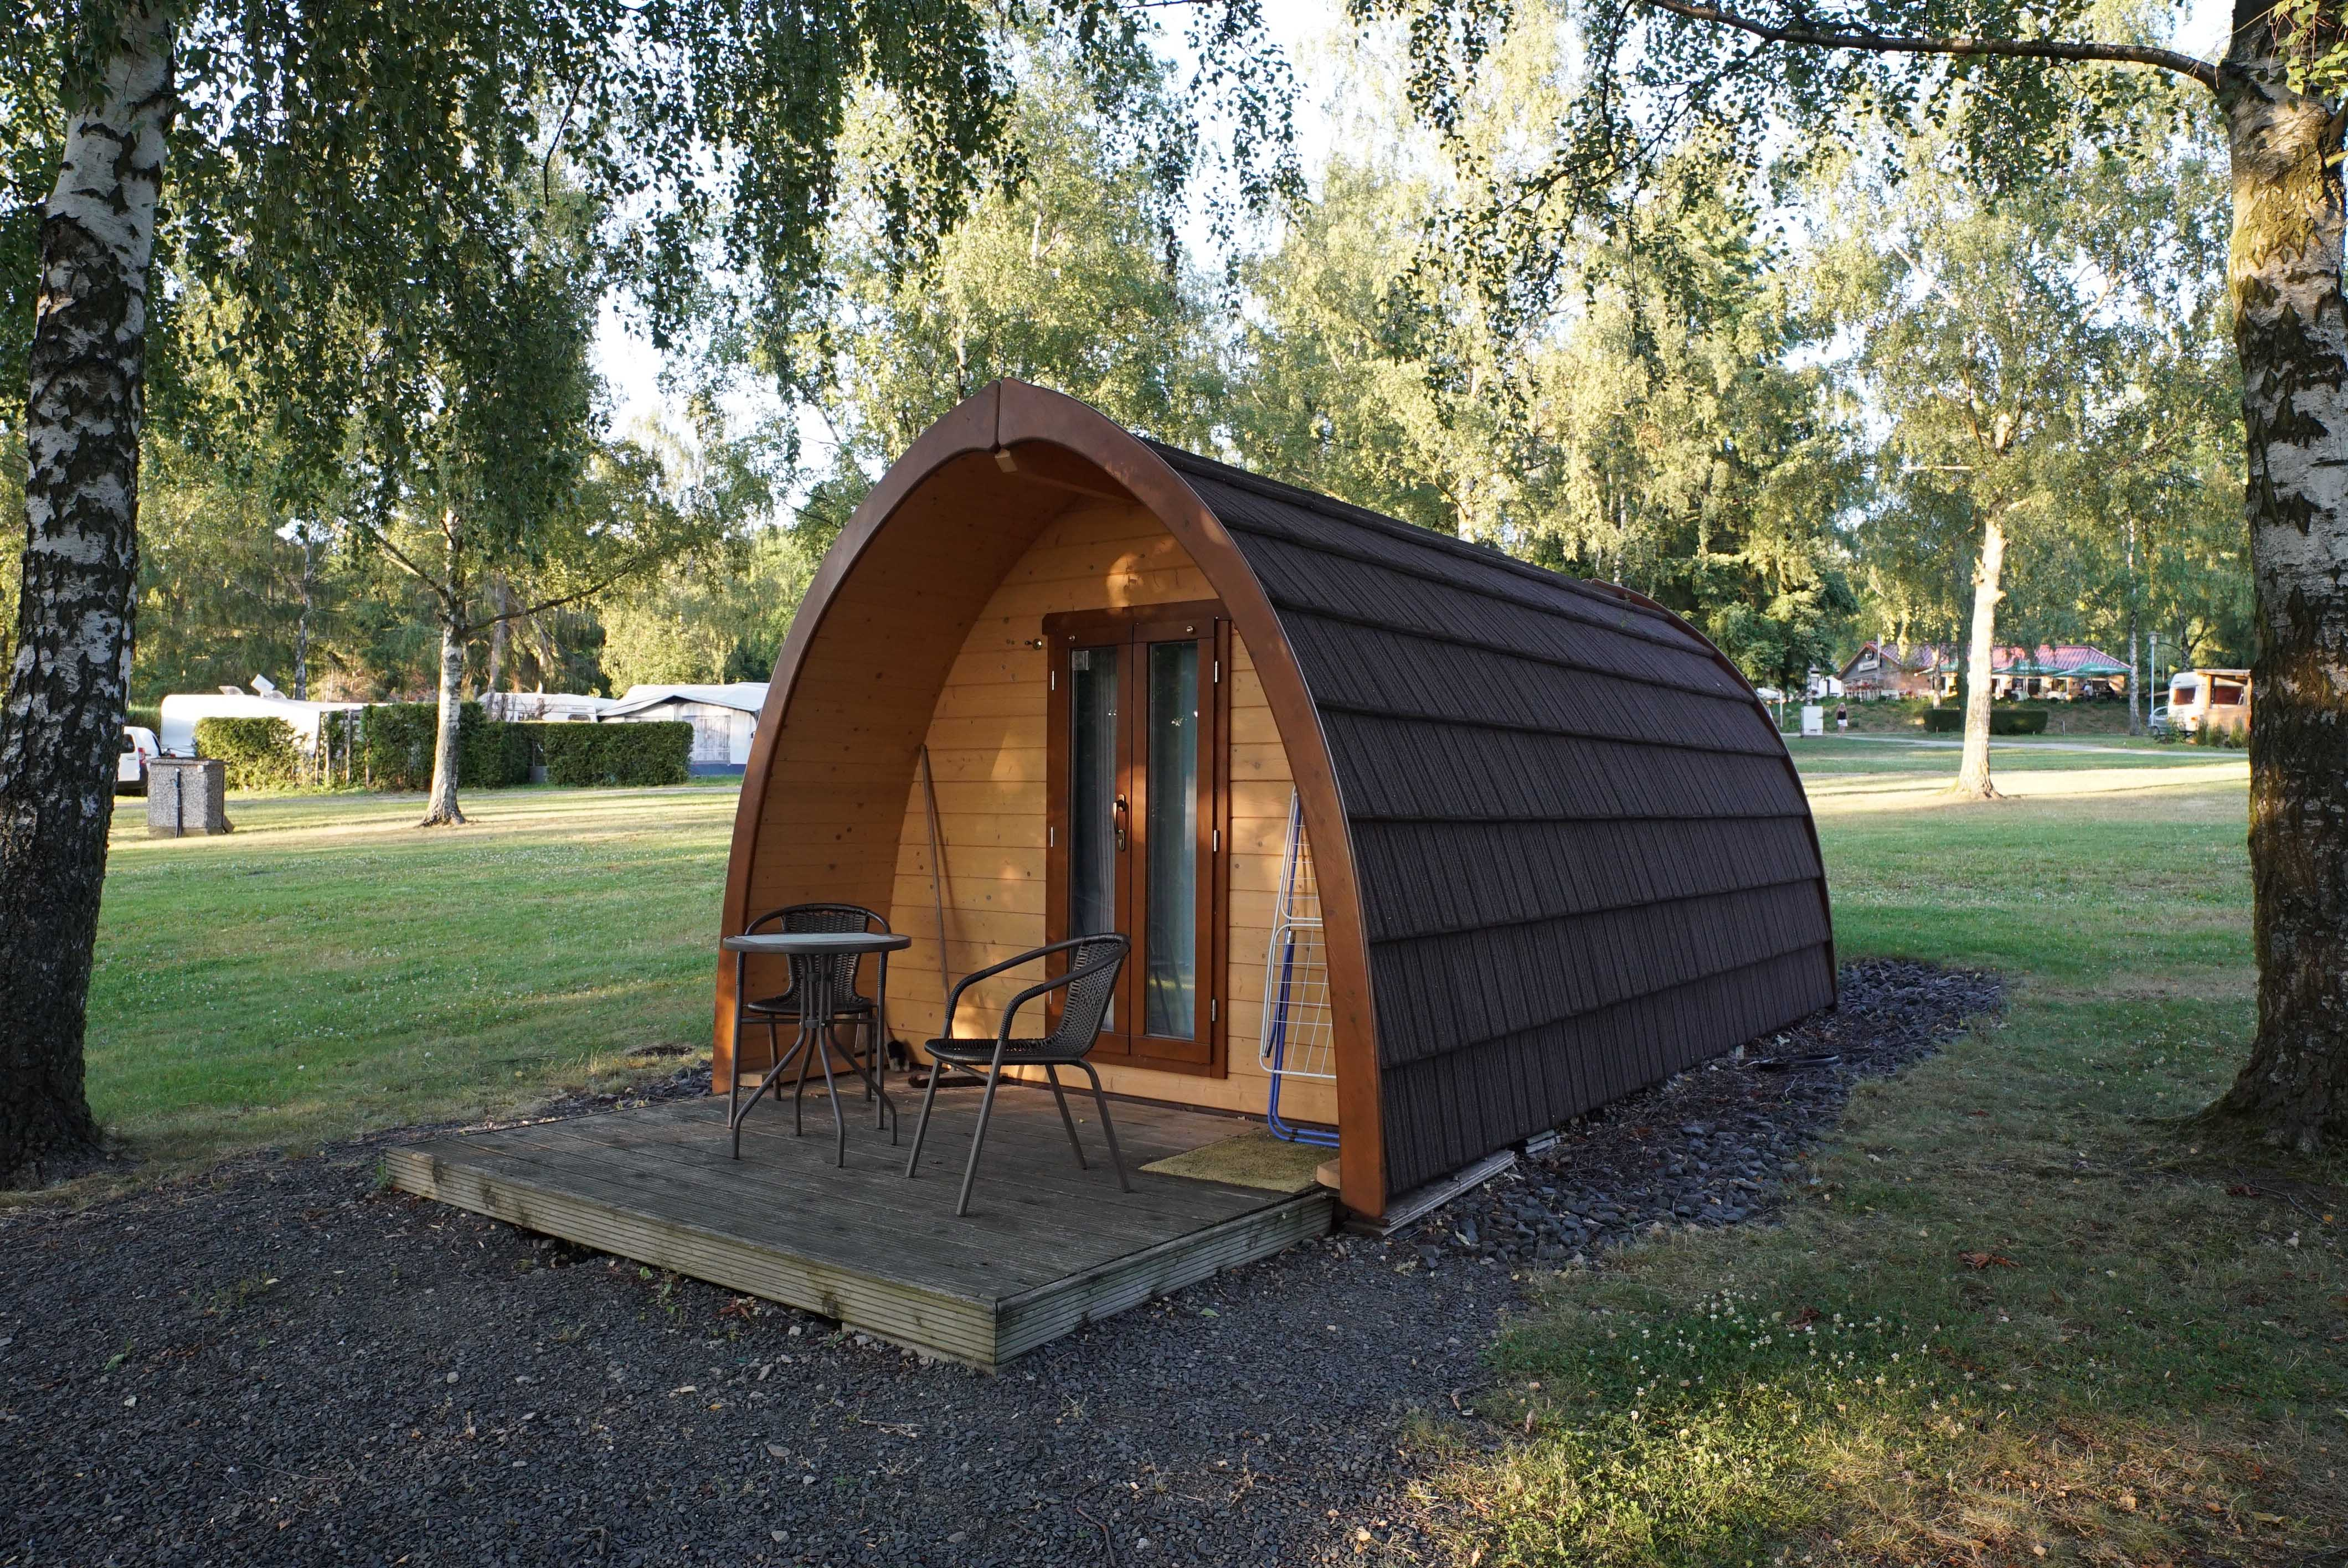 Campingplatz Sultmer Berg04